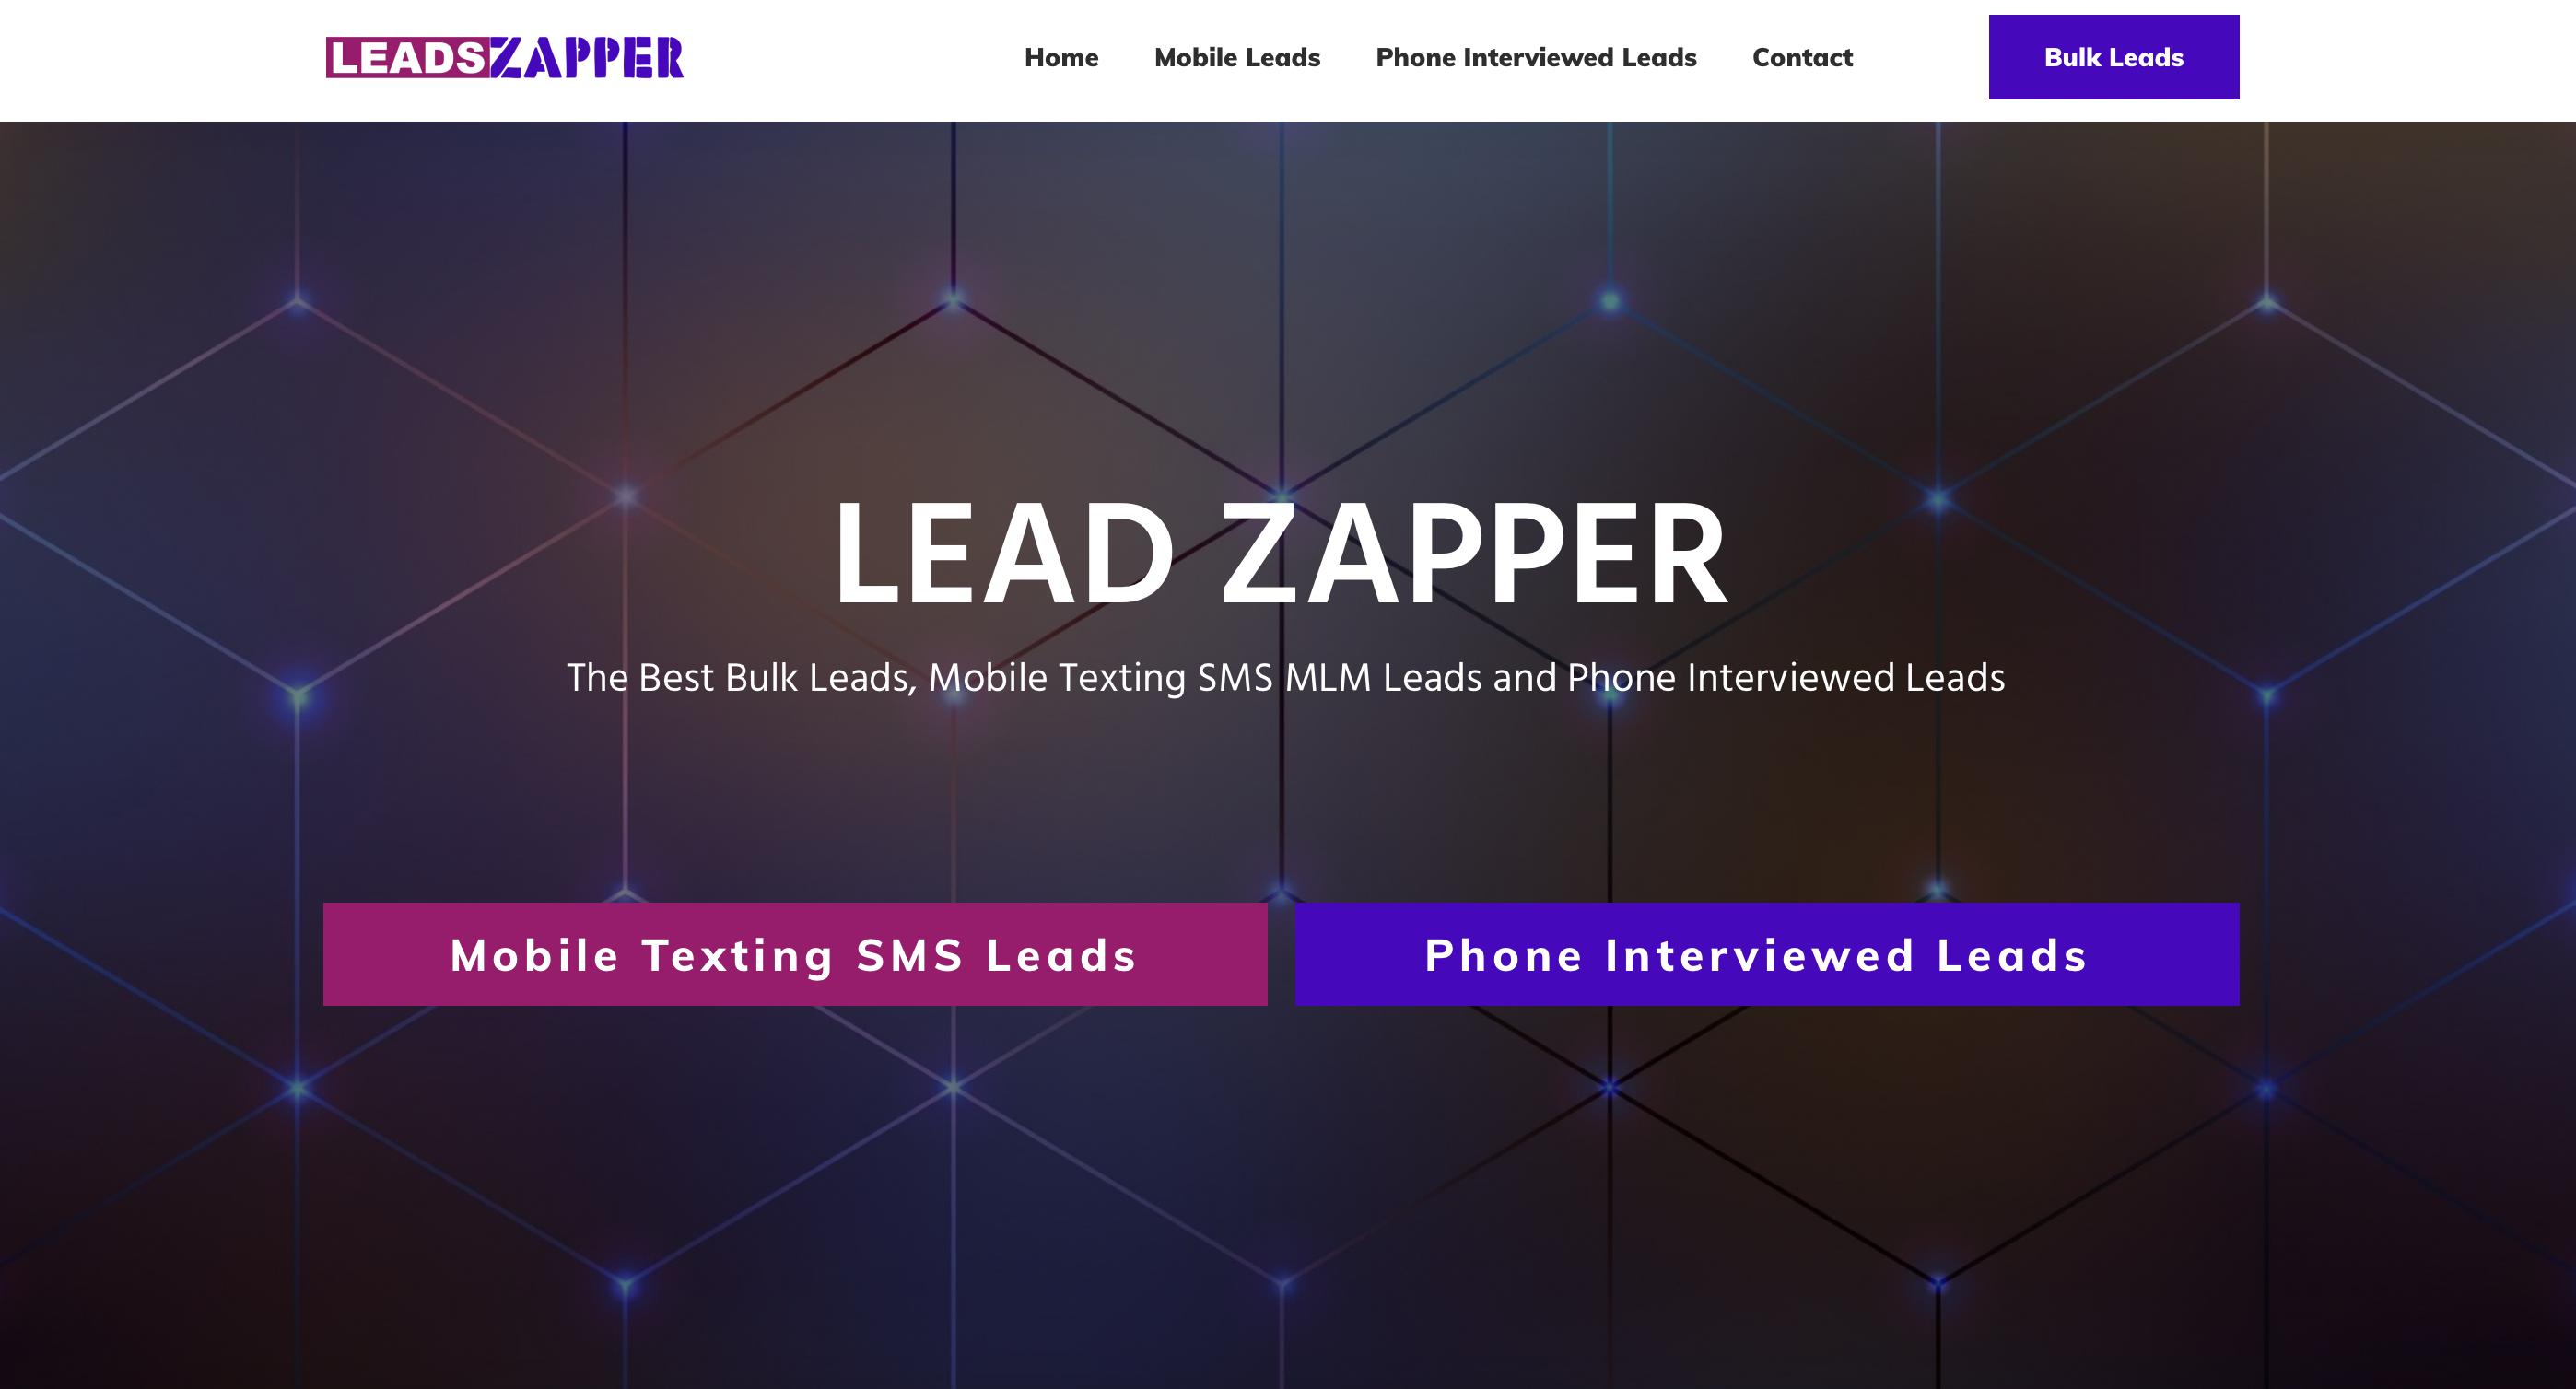 Leadzapper.com